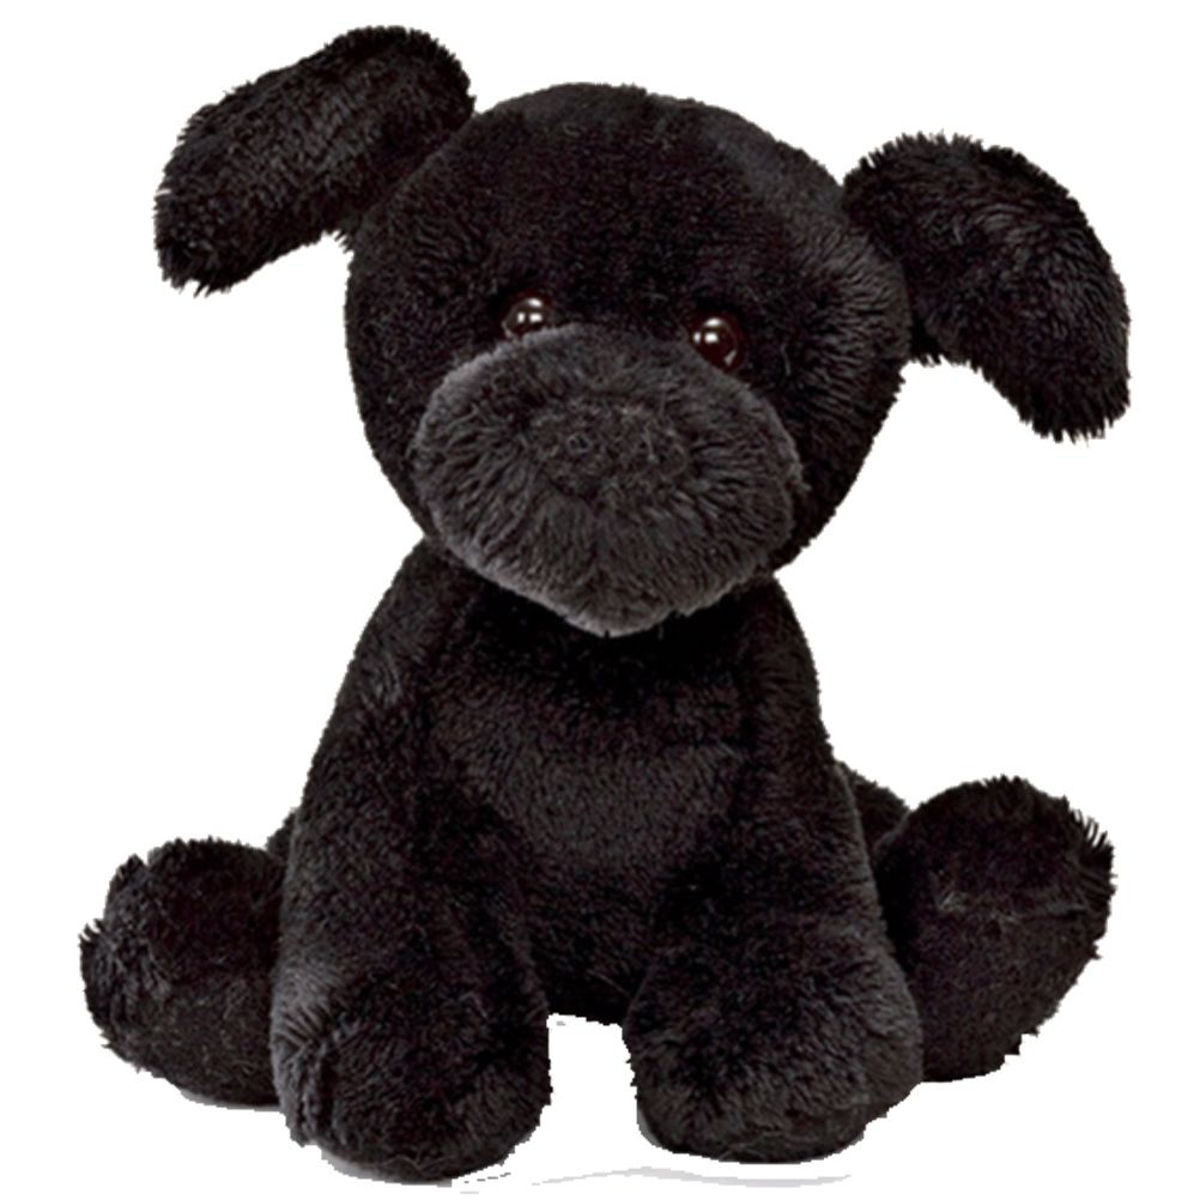 peluche gund petit chien noir sonore 12 cm. Black Bedroom Furniture Sets. Home Design Ideas